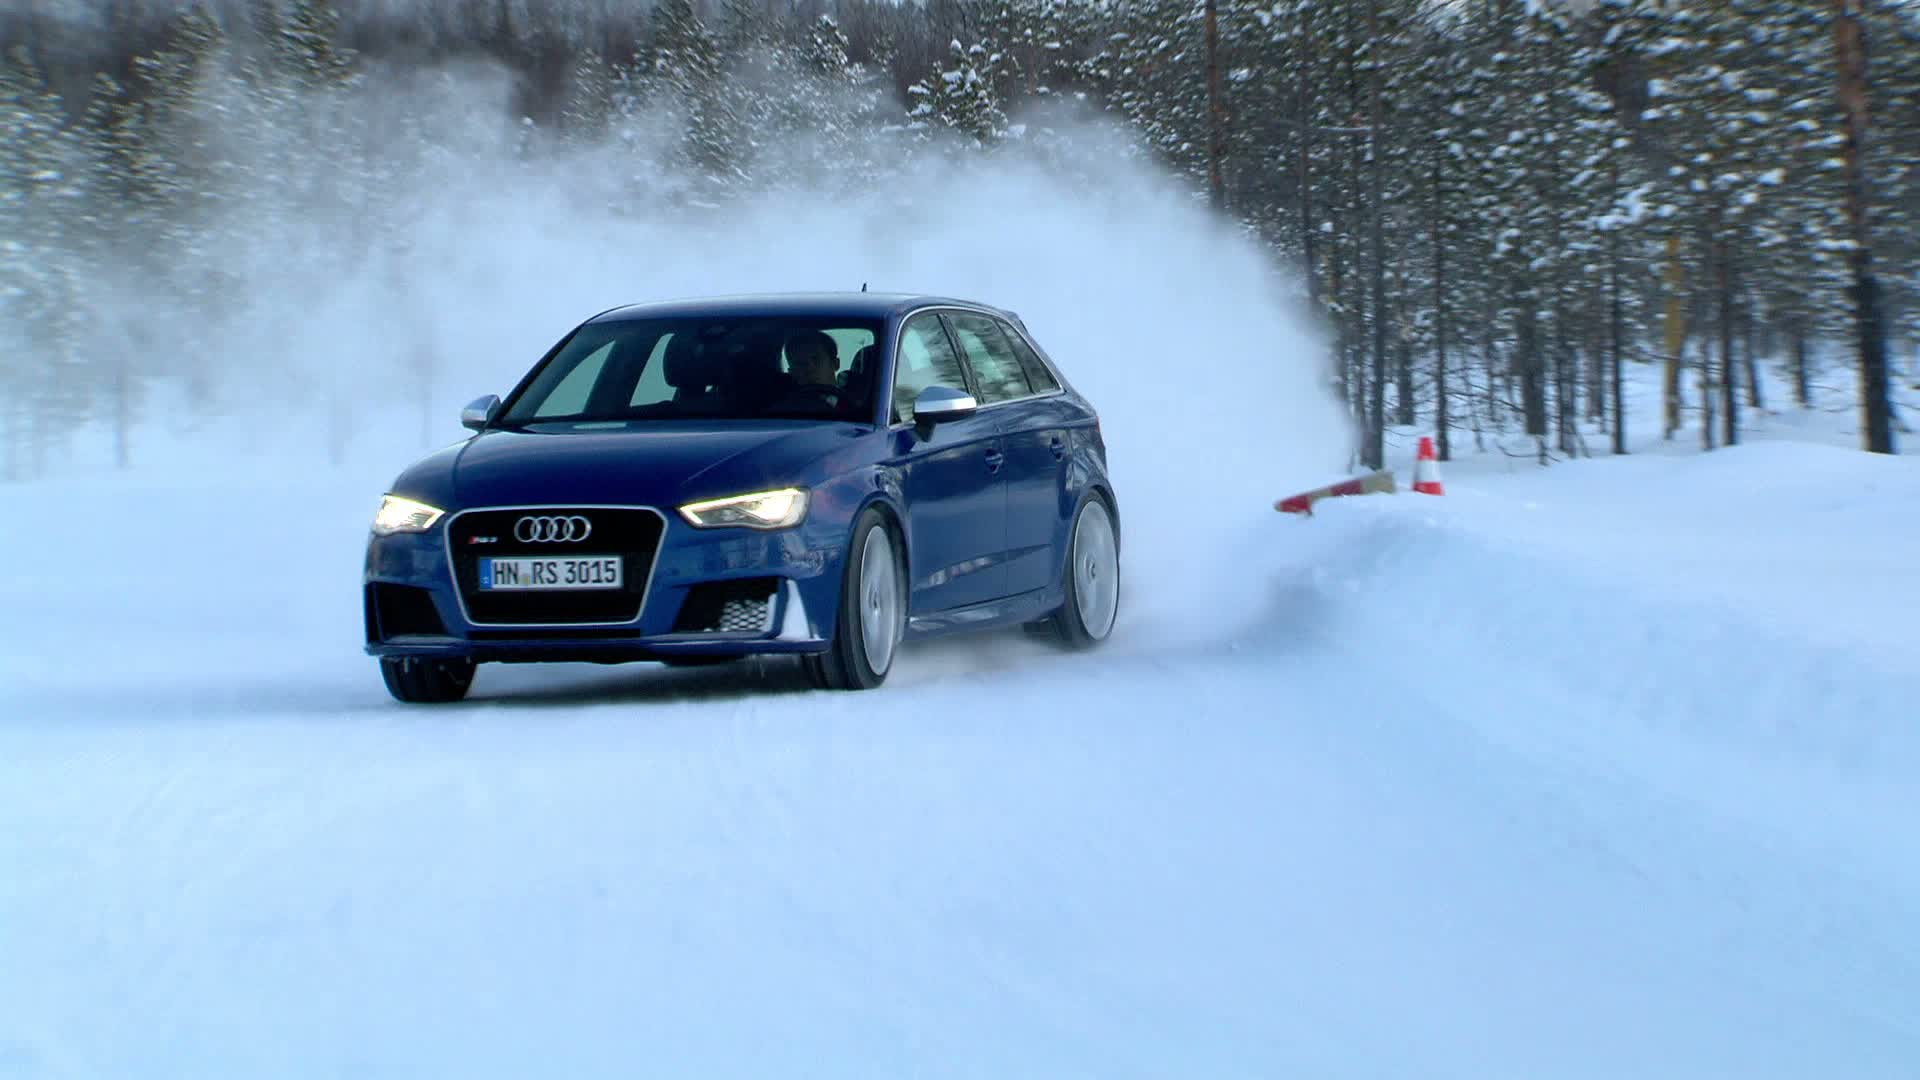 Audi RS 3 Sportback / Drifting with Mattias Ekstroem